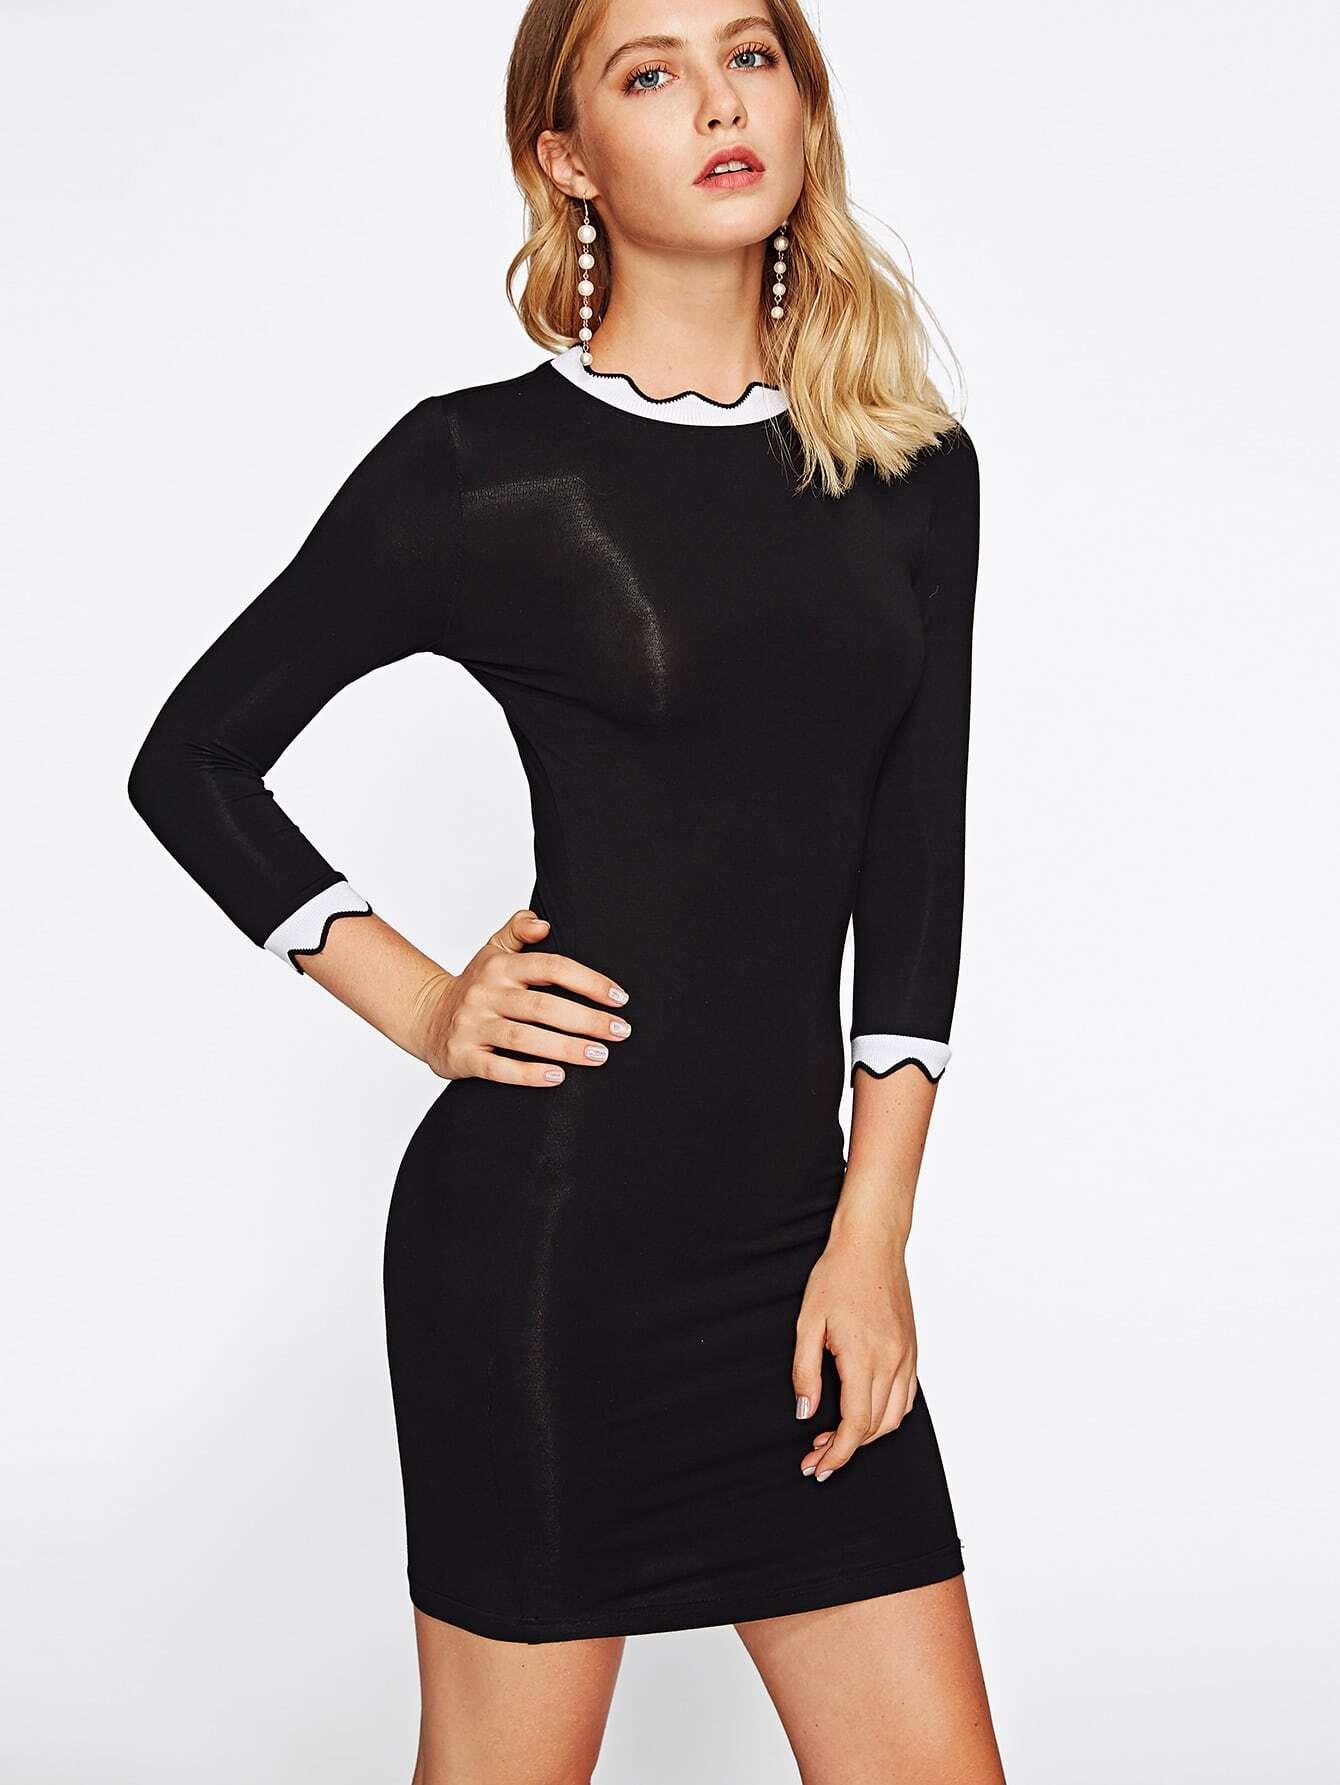 Contrast Scalloped Rib Trim Dress dress170802708